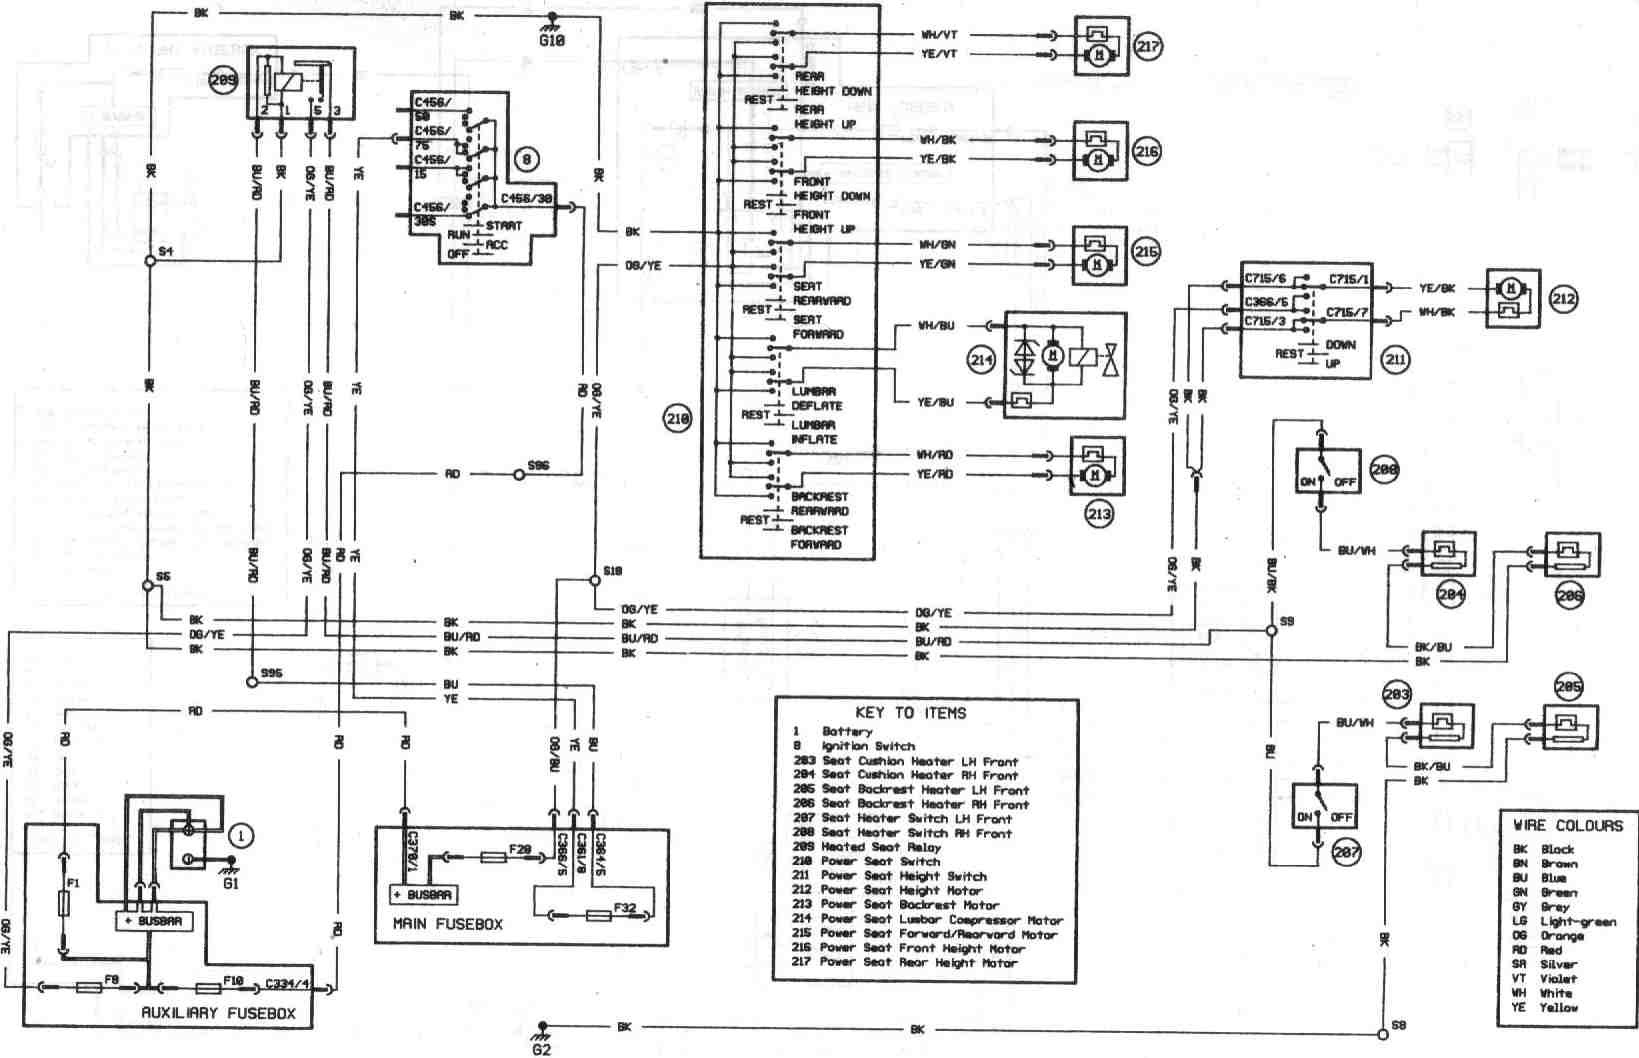 Escort Power Cord Wiring Diagram